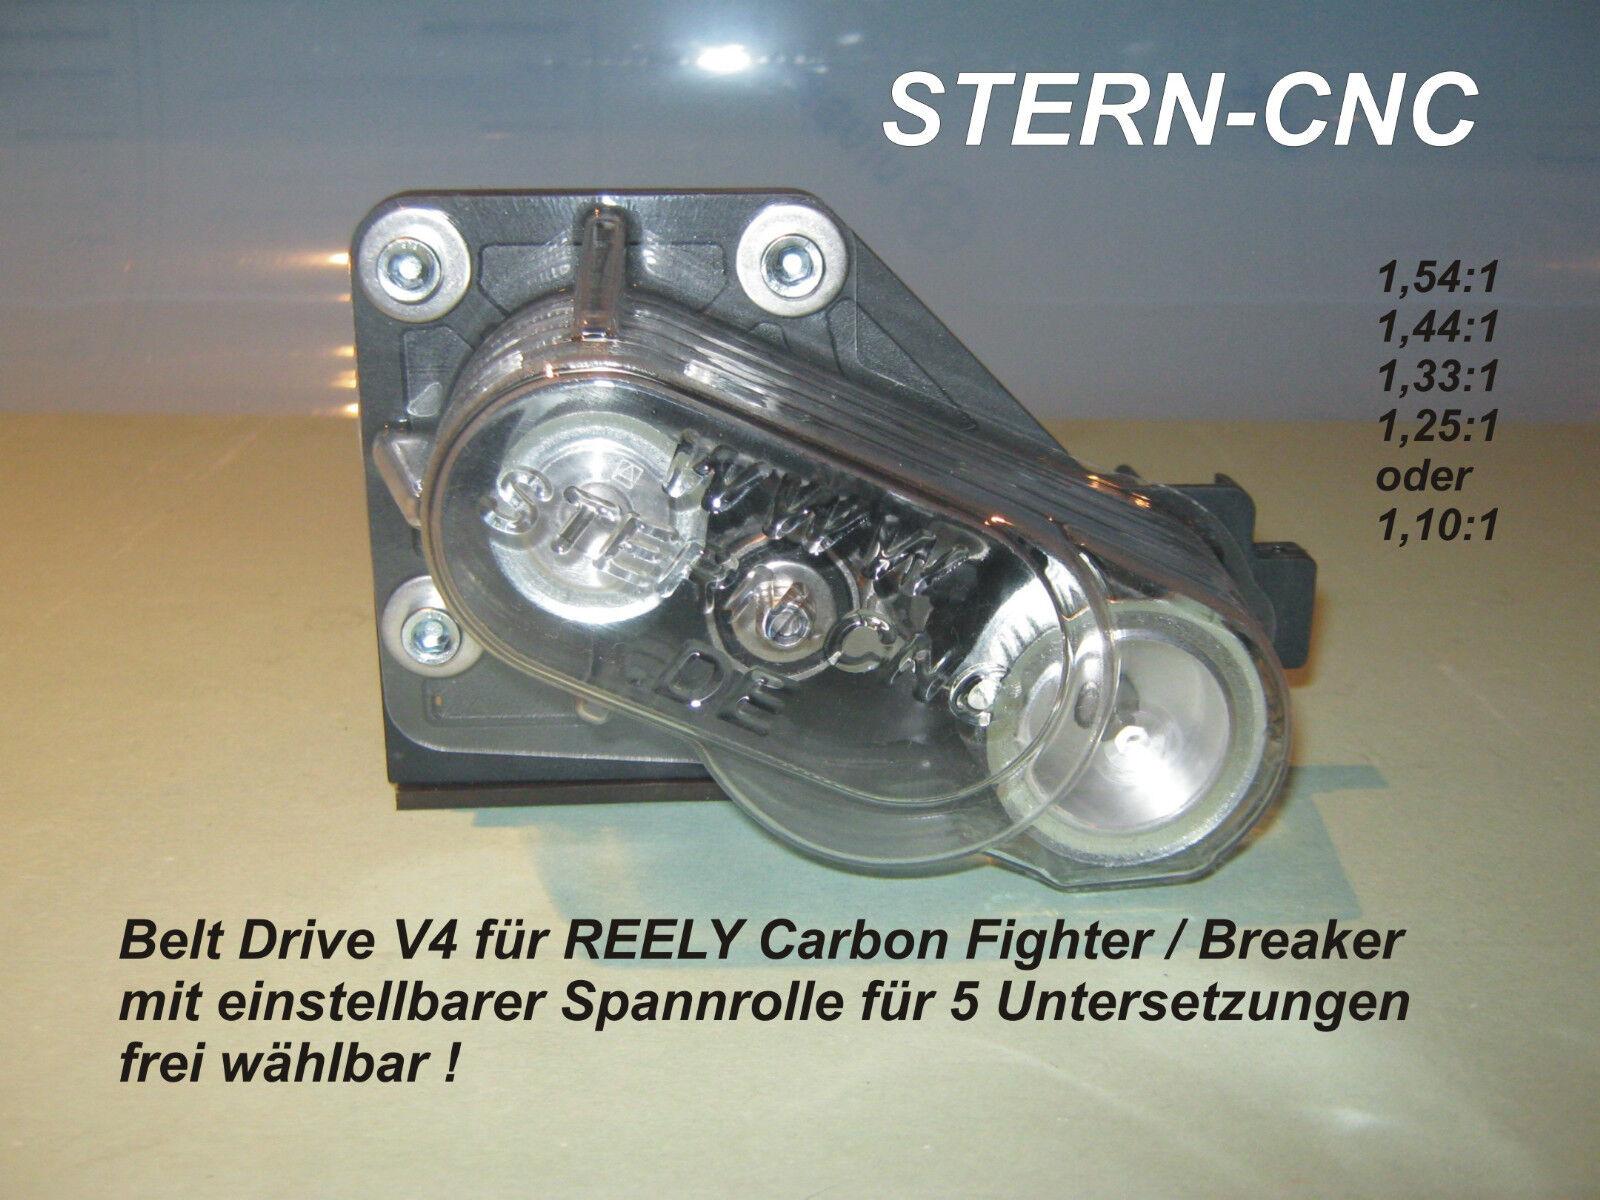 Belt Drive V4 Reely Carbon Fighter Breaker Breaker Breaker Adjustable for 5 Untersetzungen 2fb446